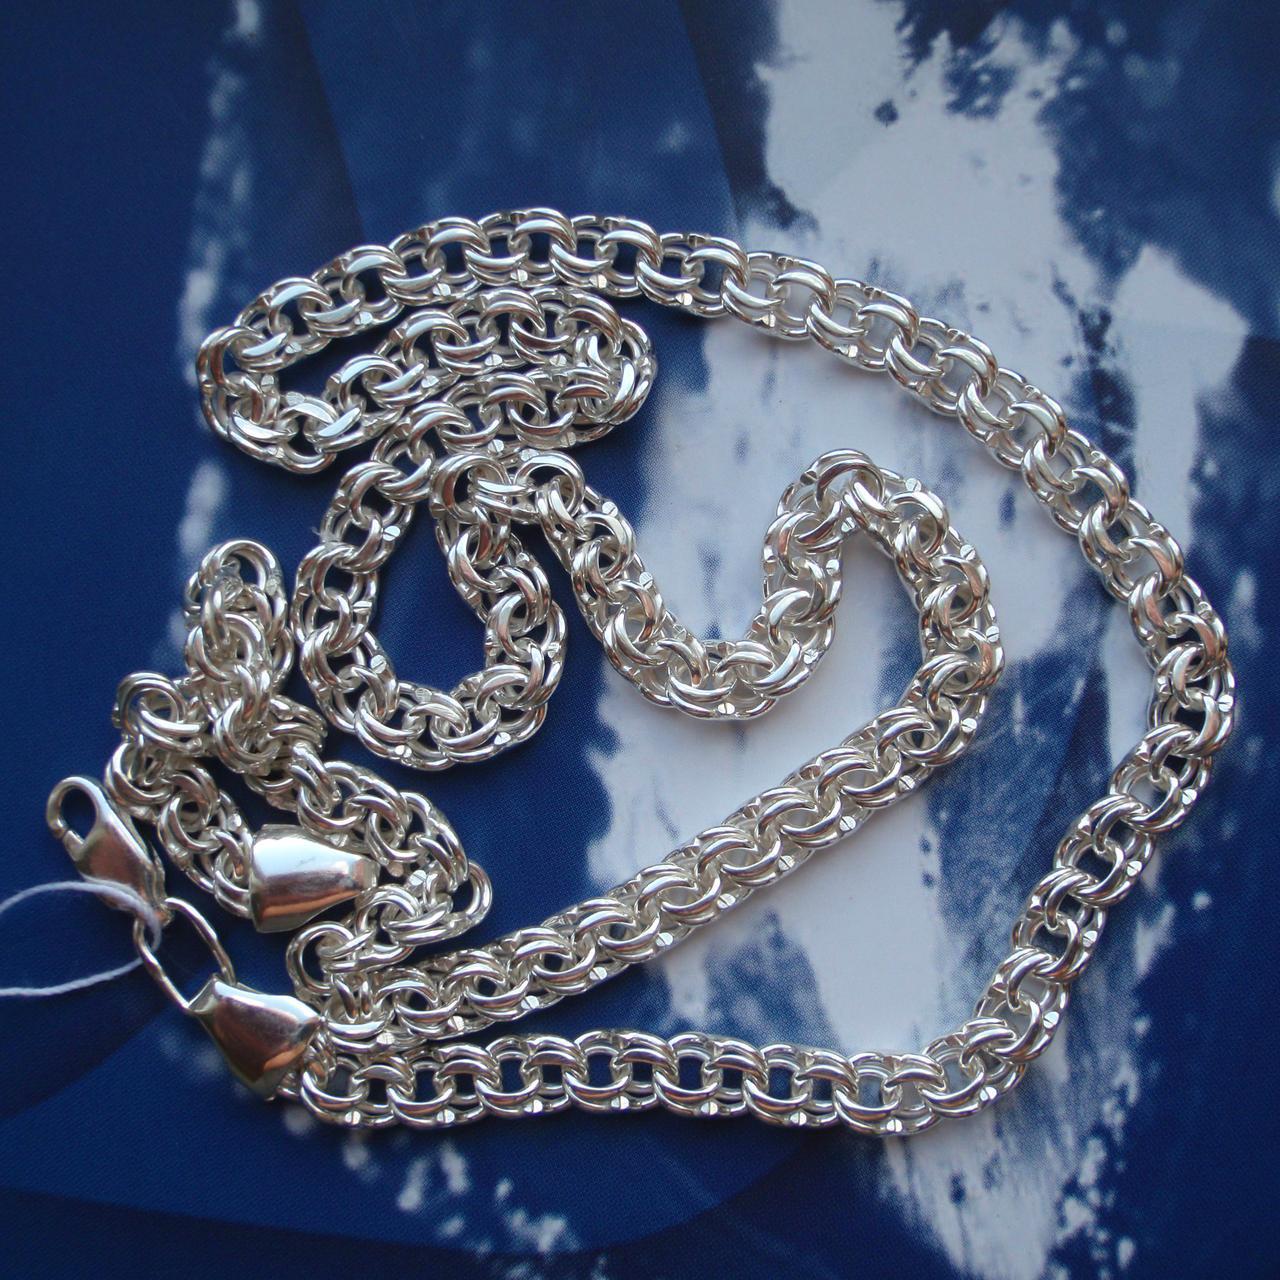 Серебряная цепочка, 500мм, 24 грамма, плетение Бисмарк, светлое серебро